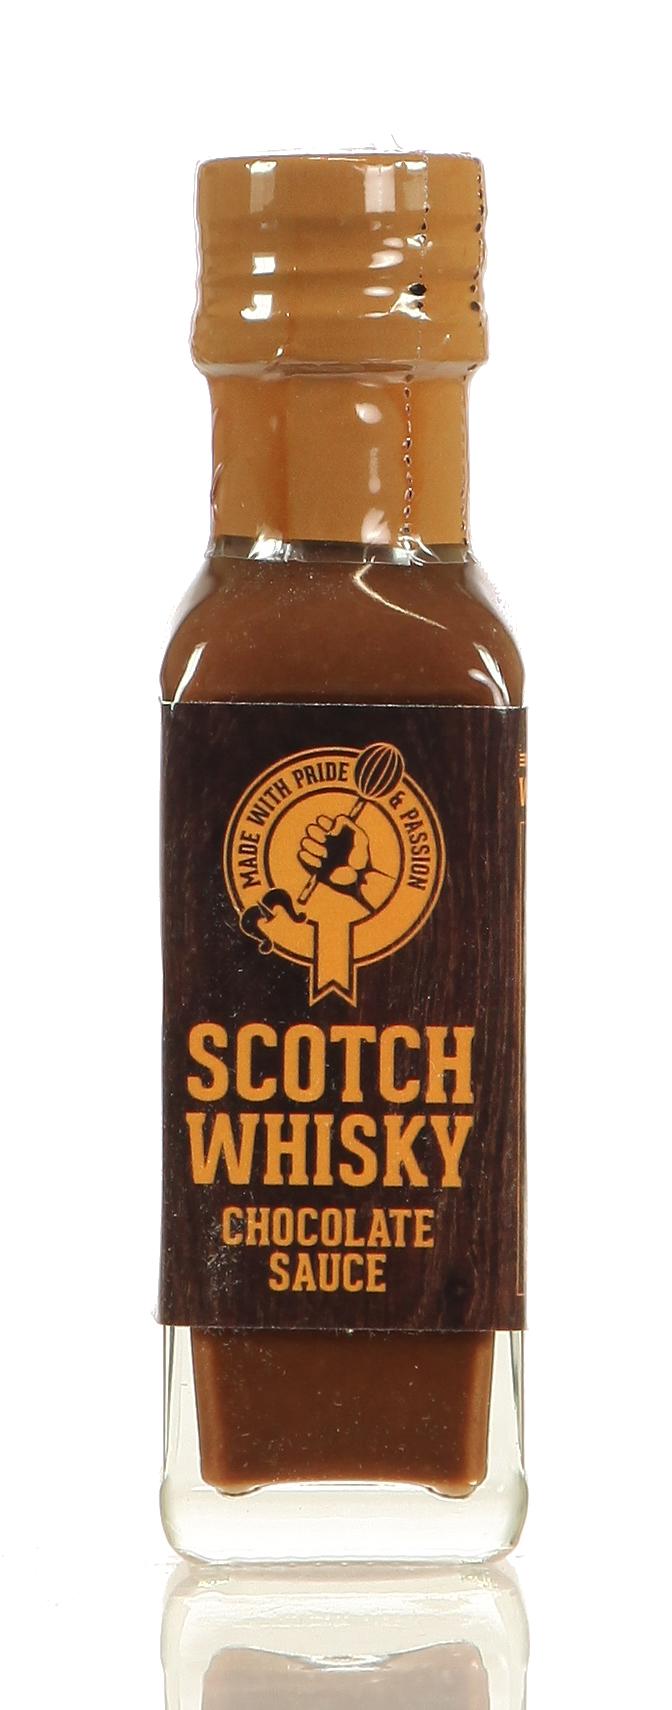 Scotch Whisky Chocolate Sauce